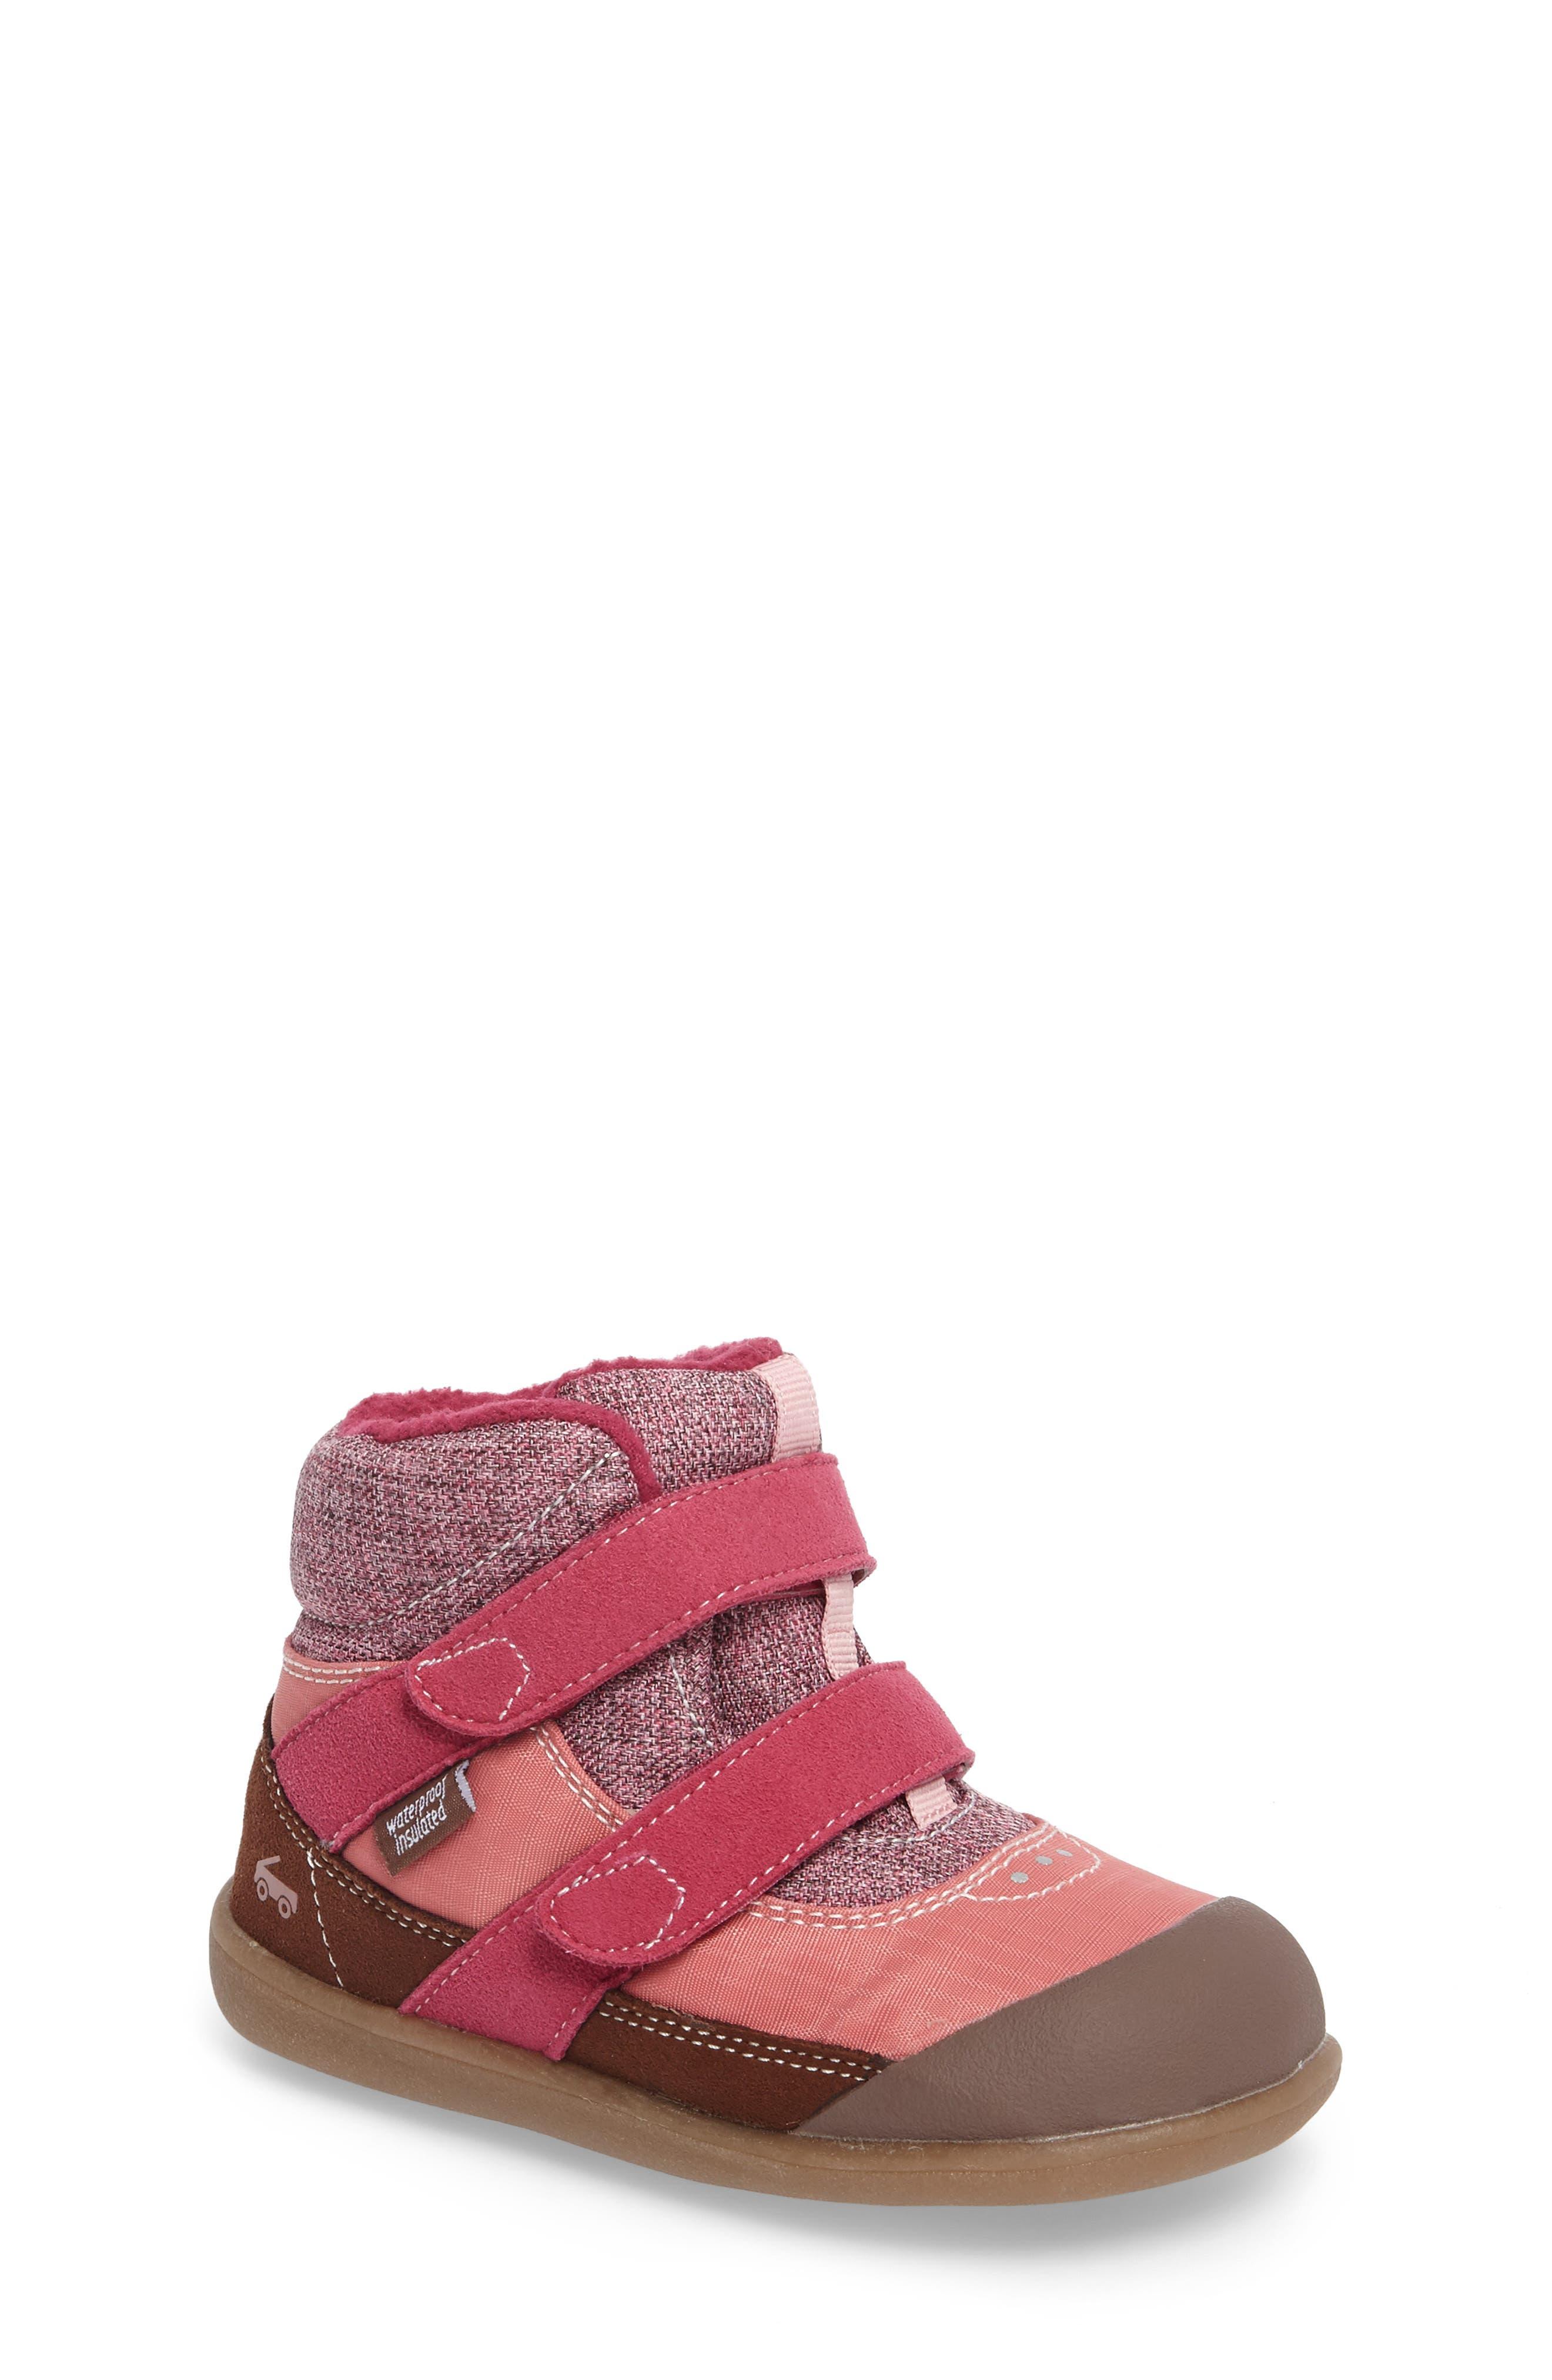 Atlas Waterproof Boot,                         Main,                         color, Pink